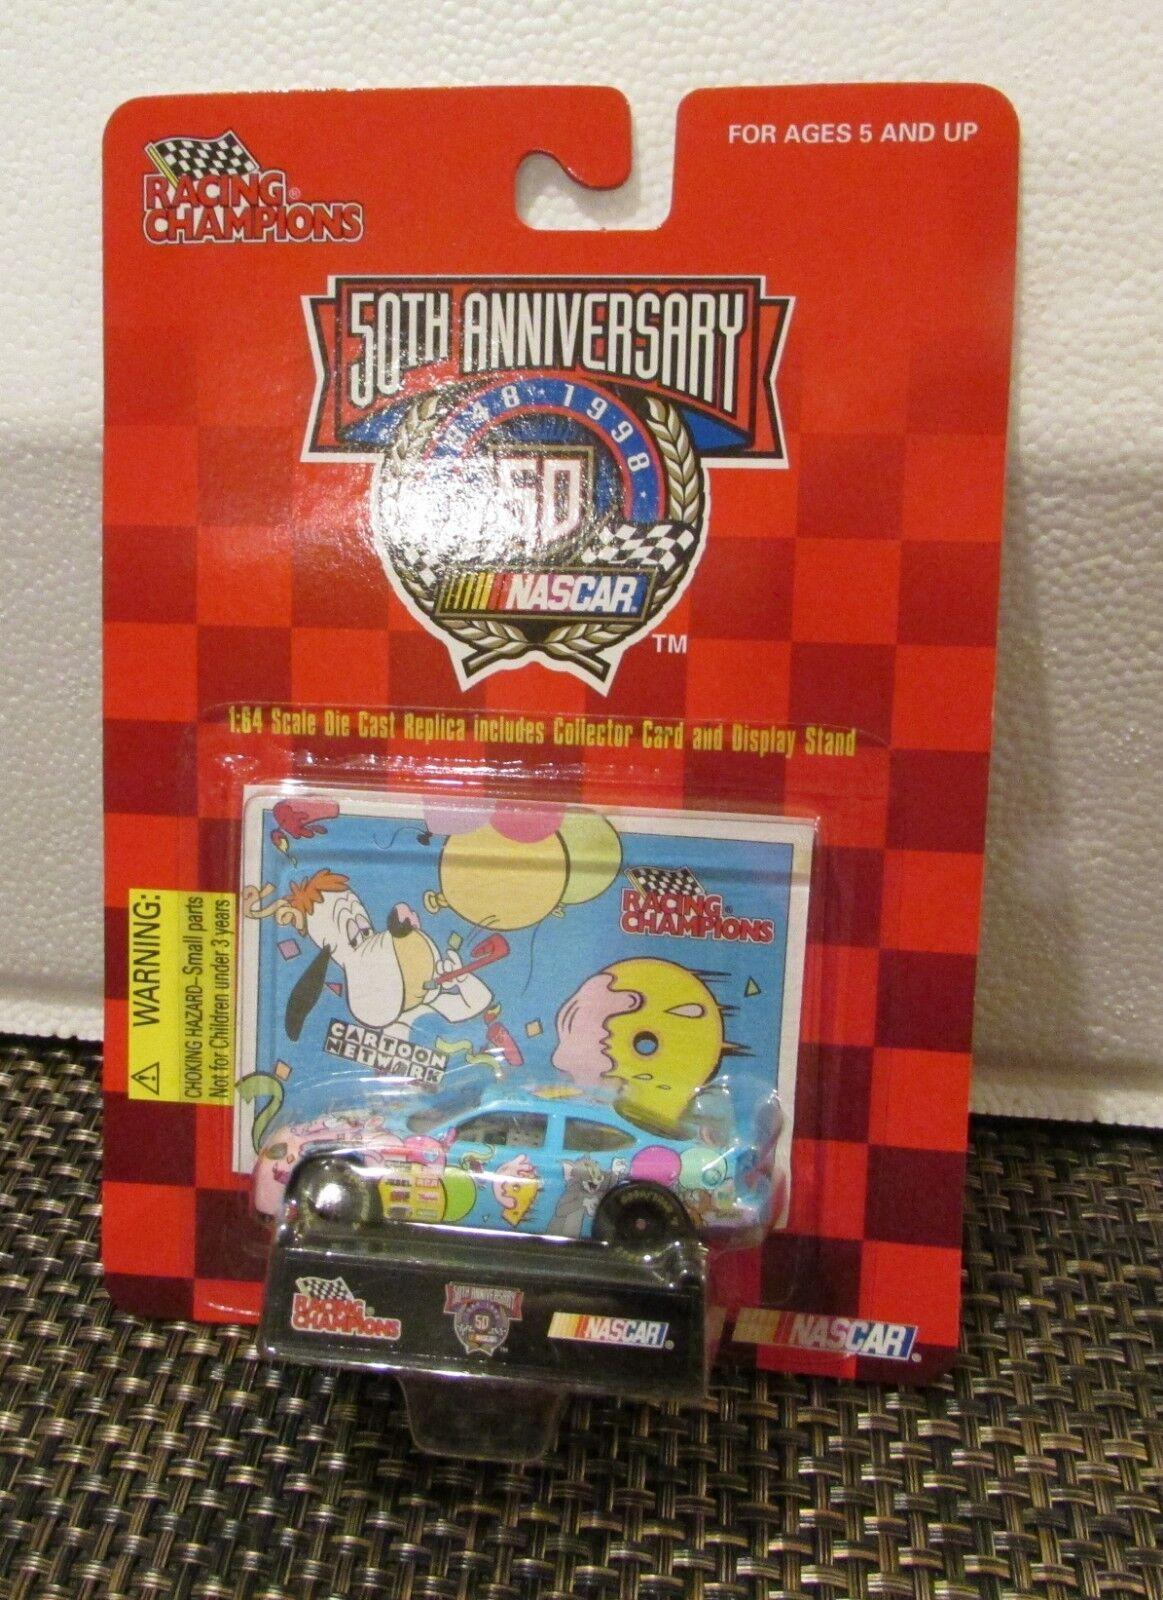 NASCAR 50th Anniversary Edition Cartoon Network Racing Champions 1998 New